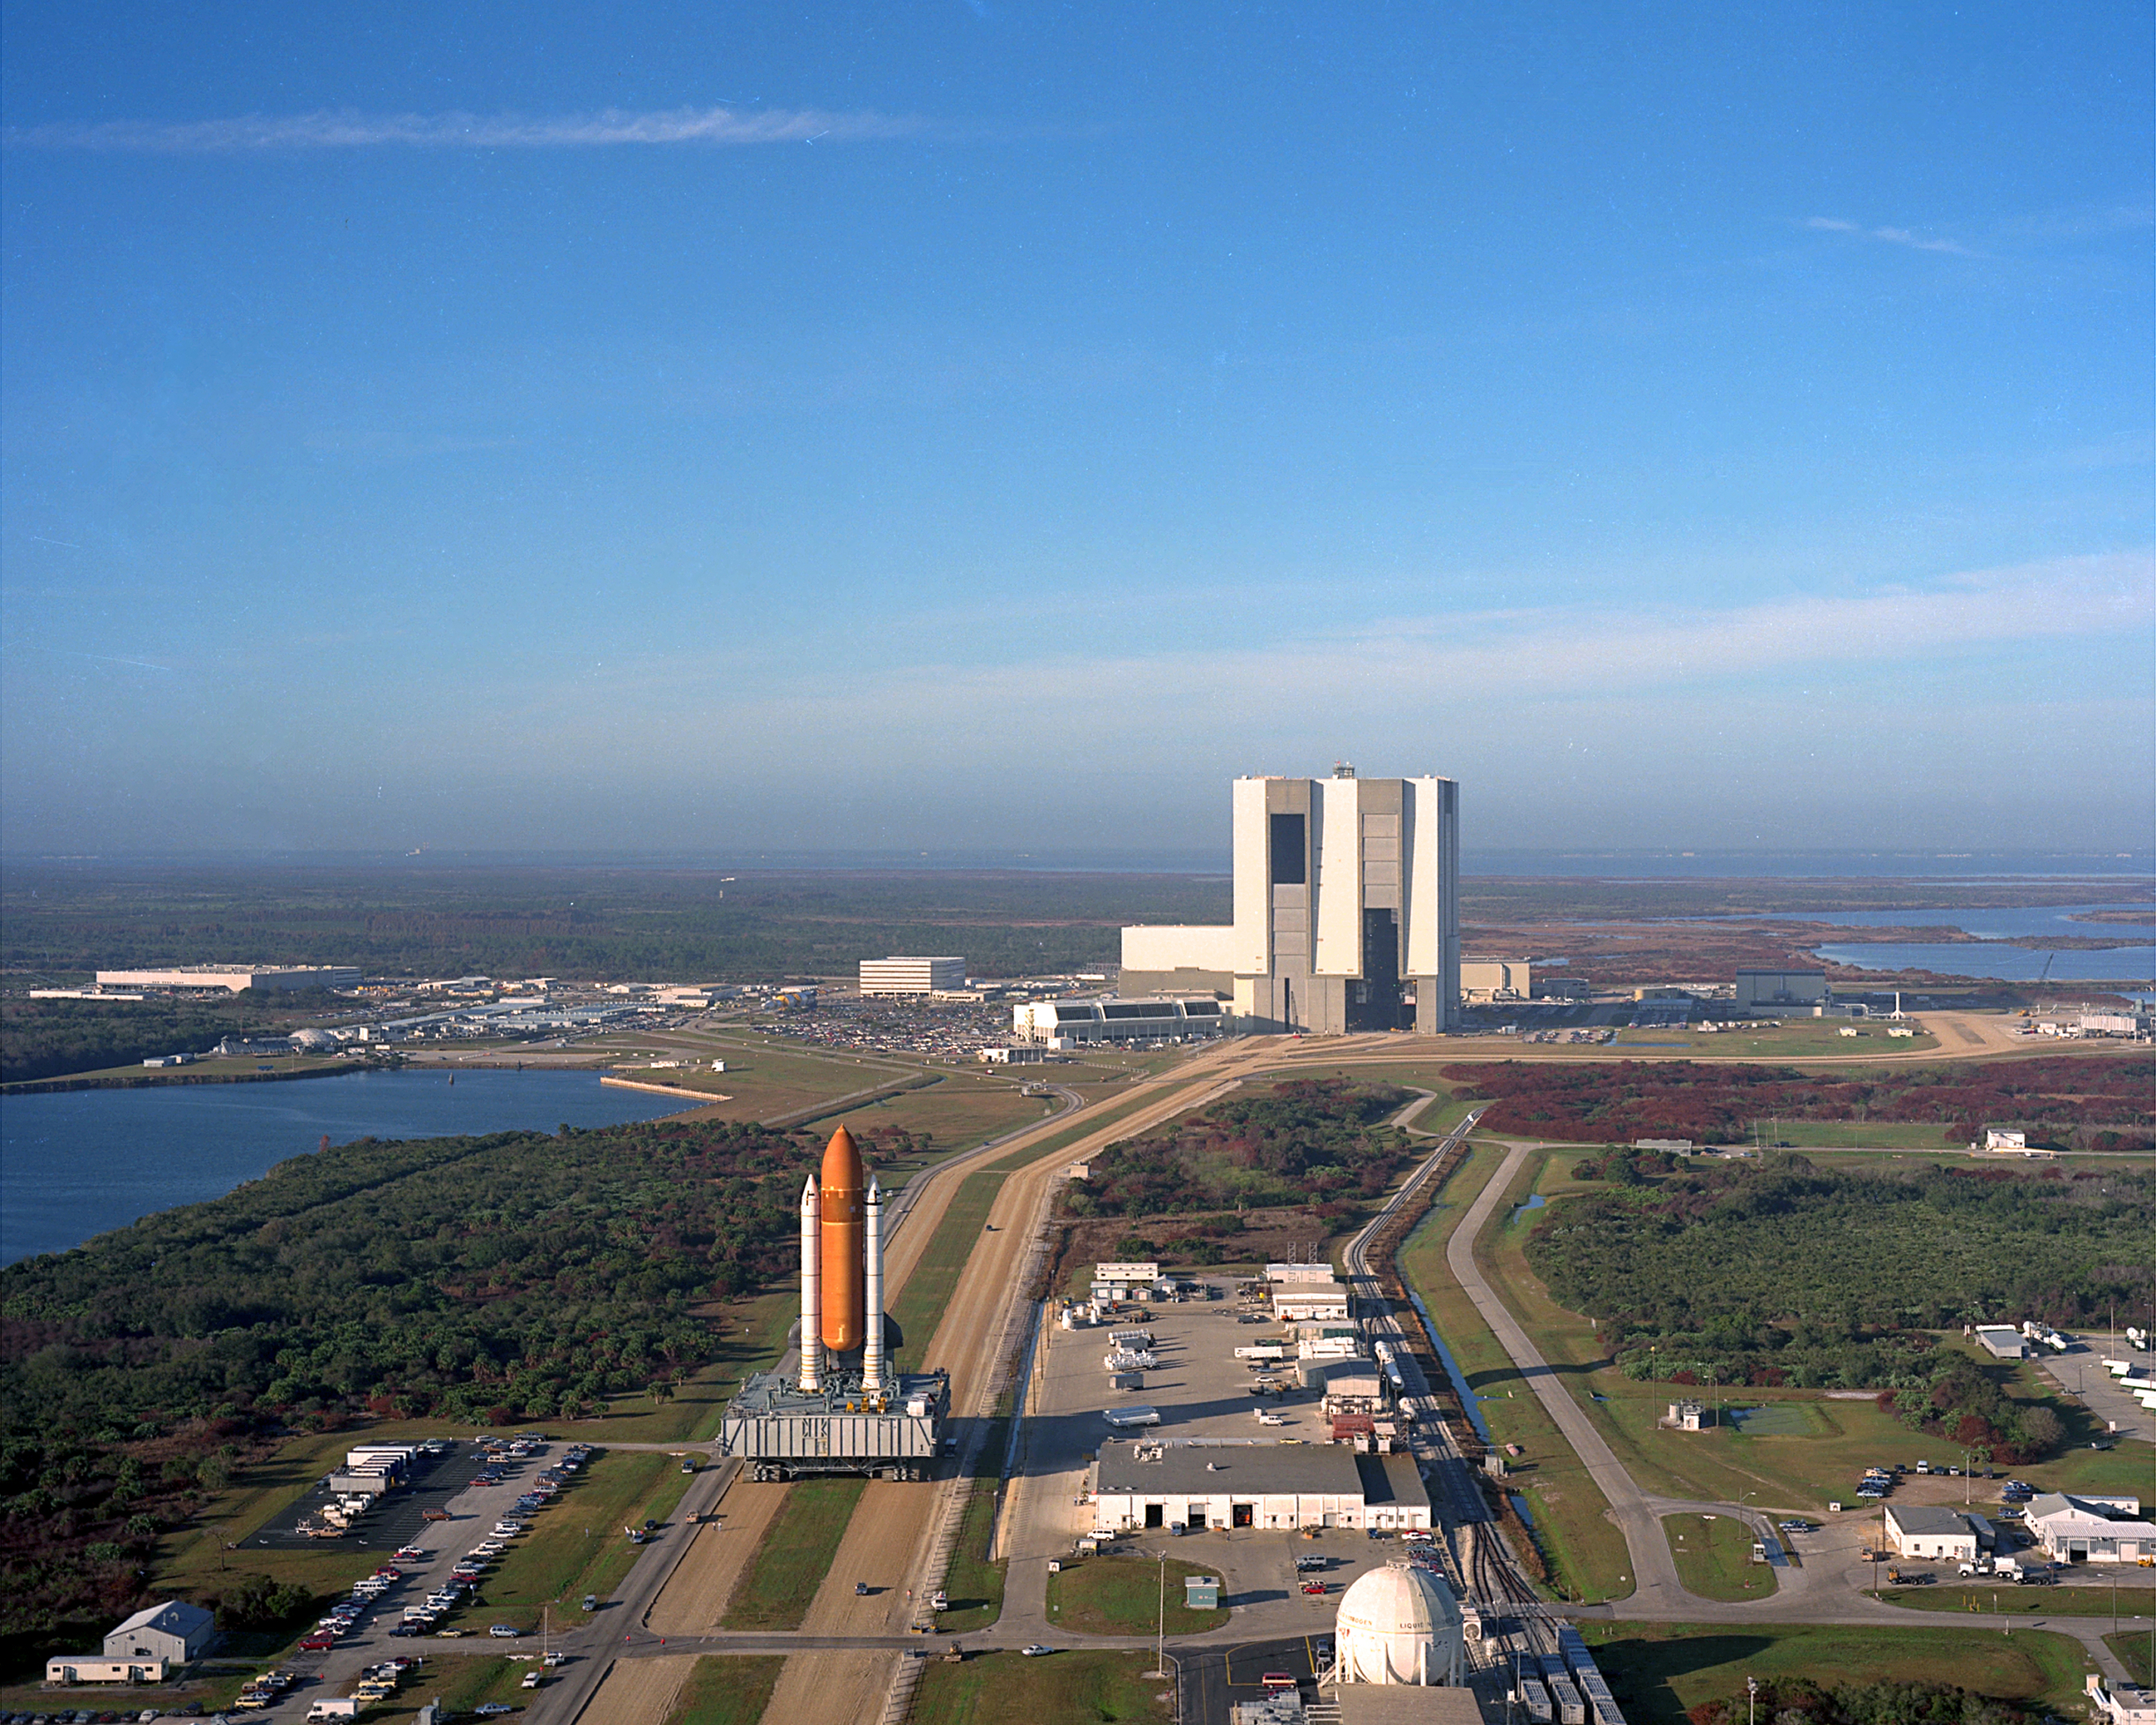 Космический центр имени Кеннеди